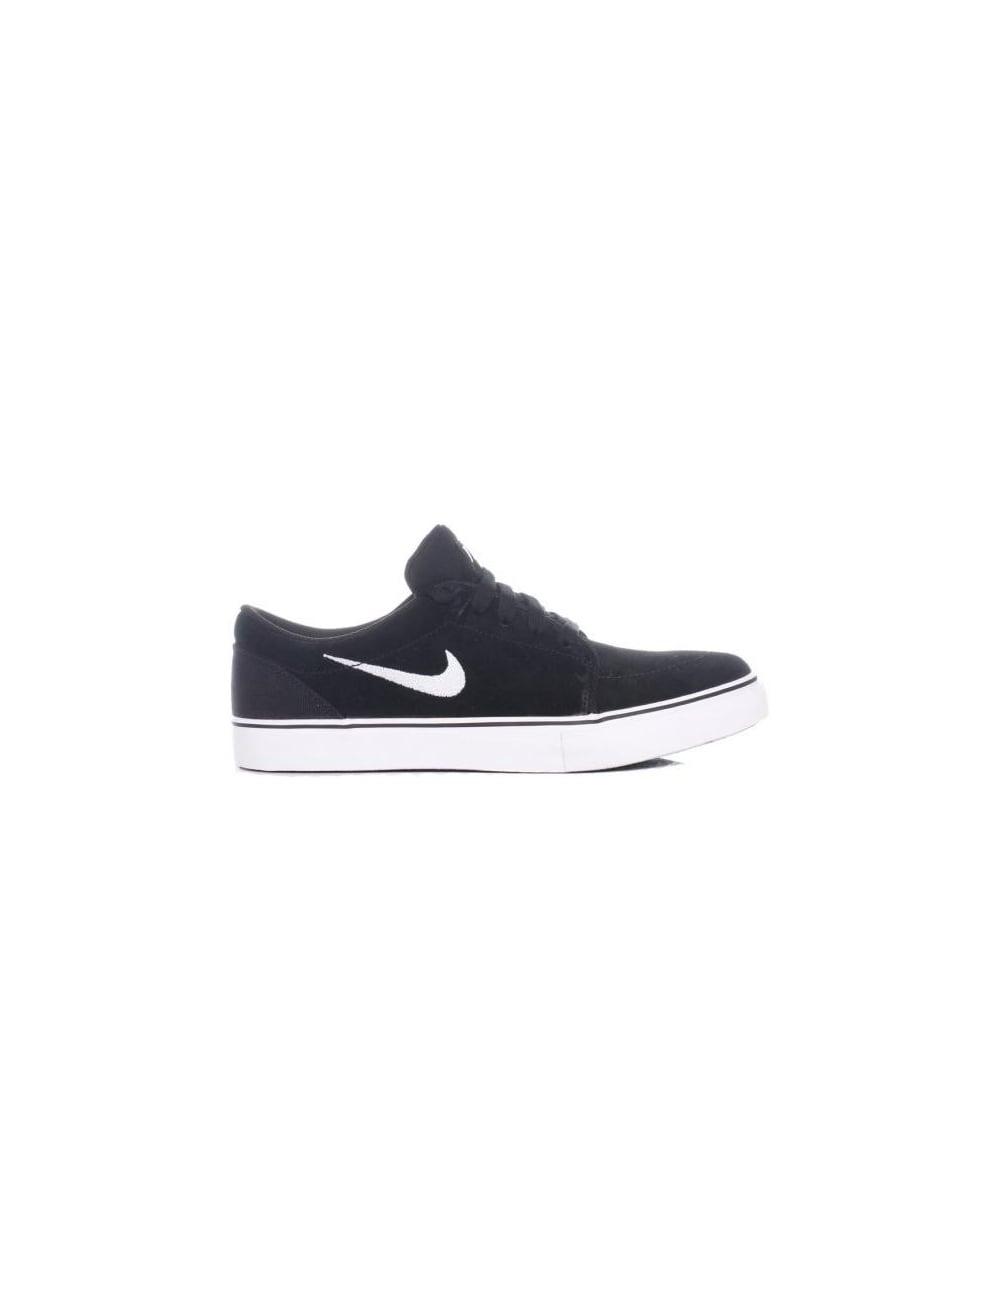 Nike Sb Satire Black Footwear From Fat Buddha Store Uk